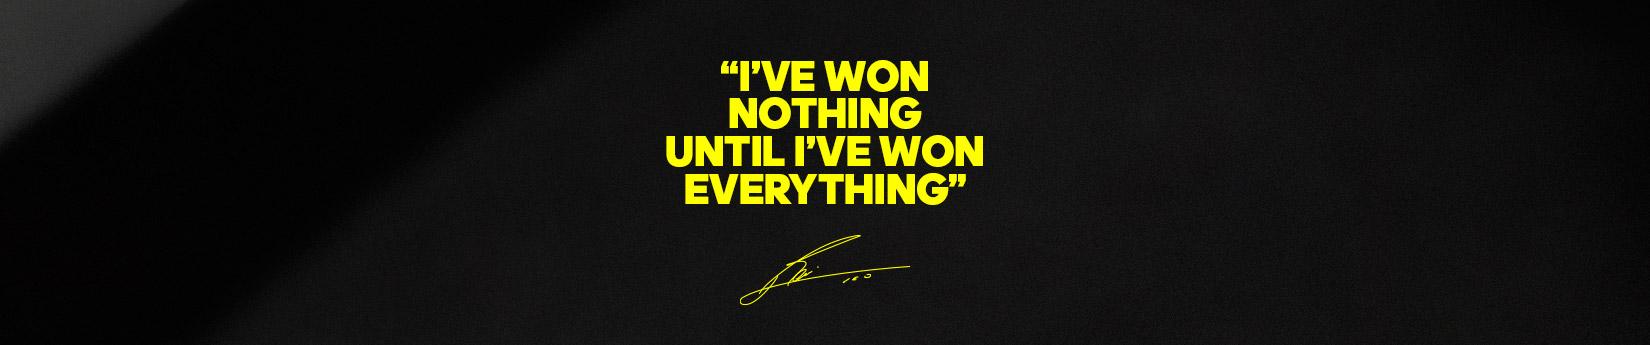 Messi Quote